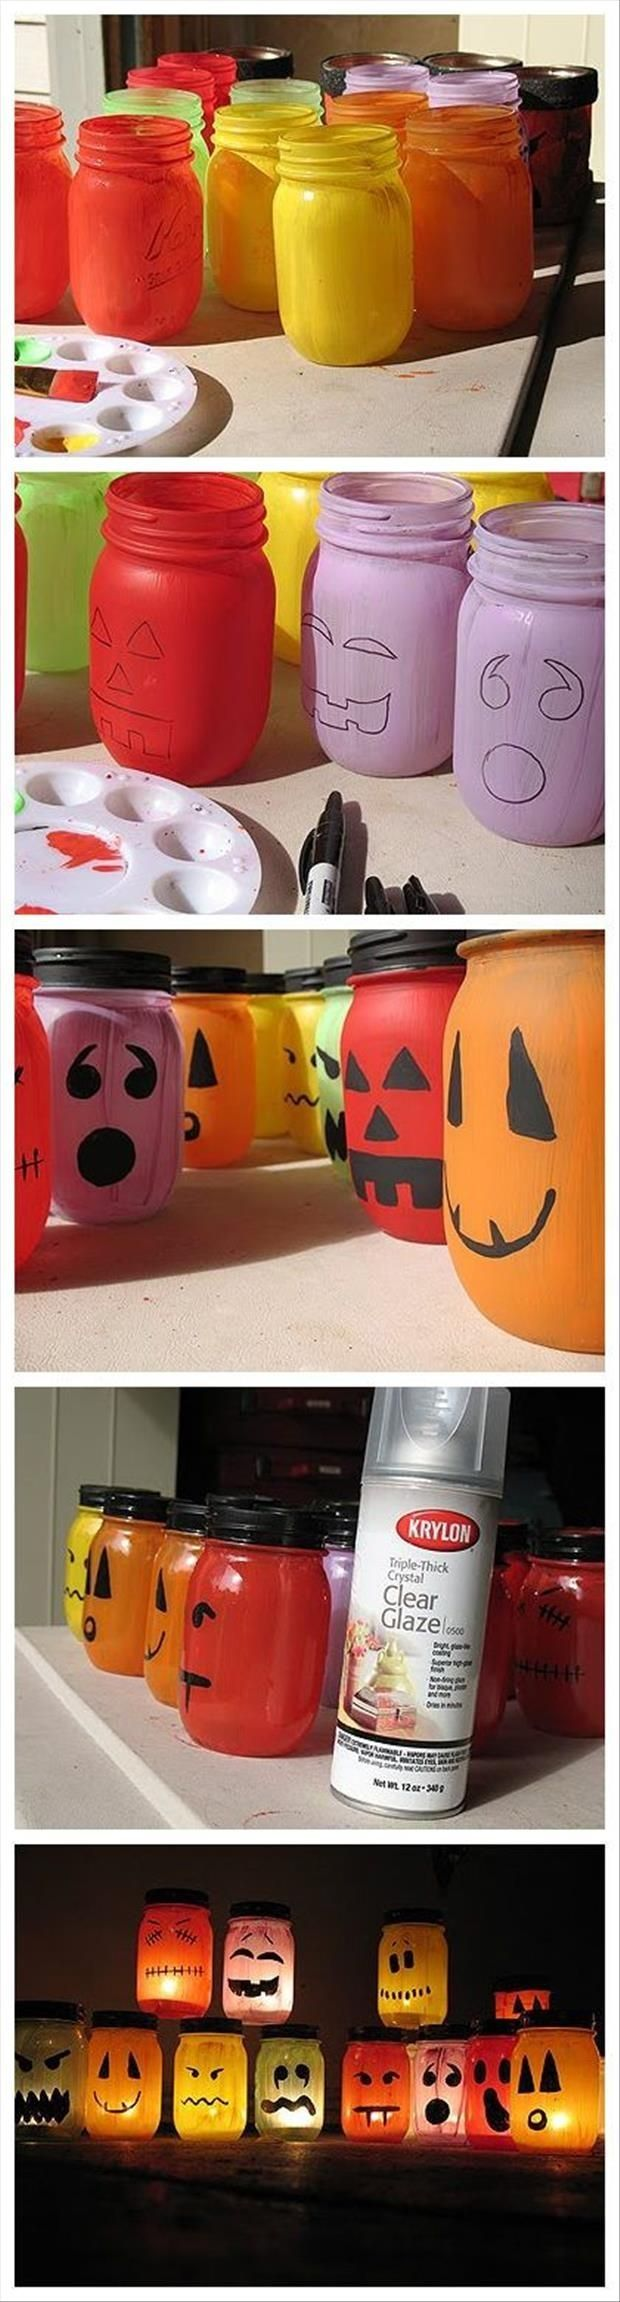 DIY Halloween Jars halloween halloween crafts halloween ideas diy halloween halloween kids crafts crafty halloween ideas diy halloween decorations diy halloween party diy halloween party decor